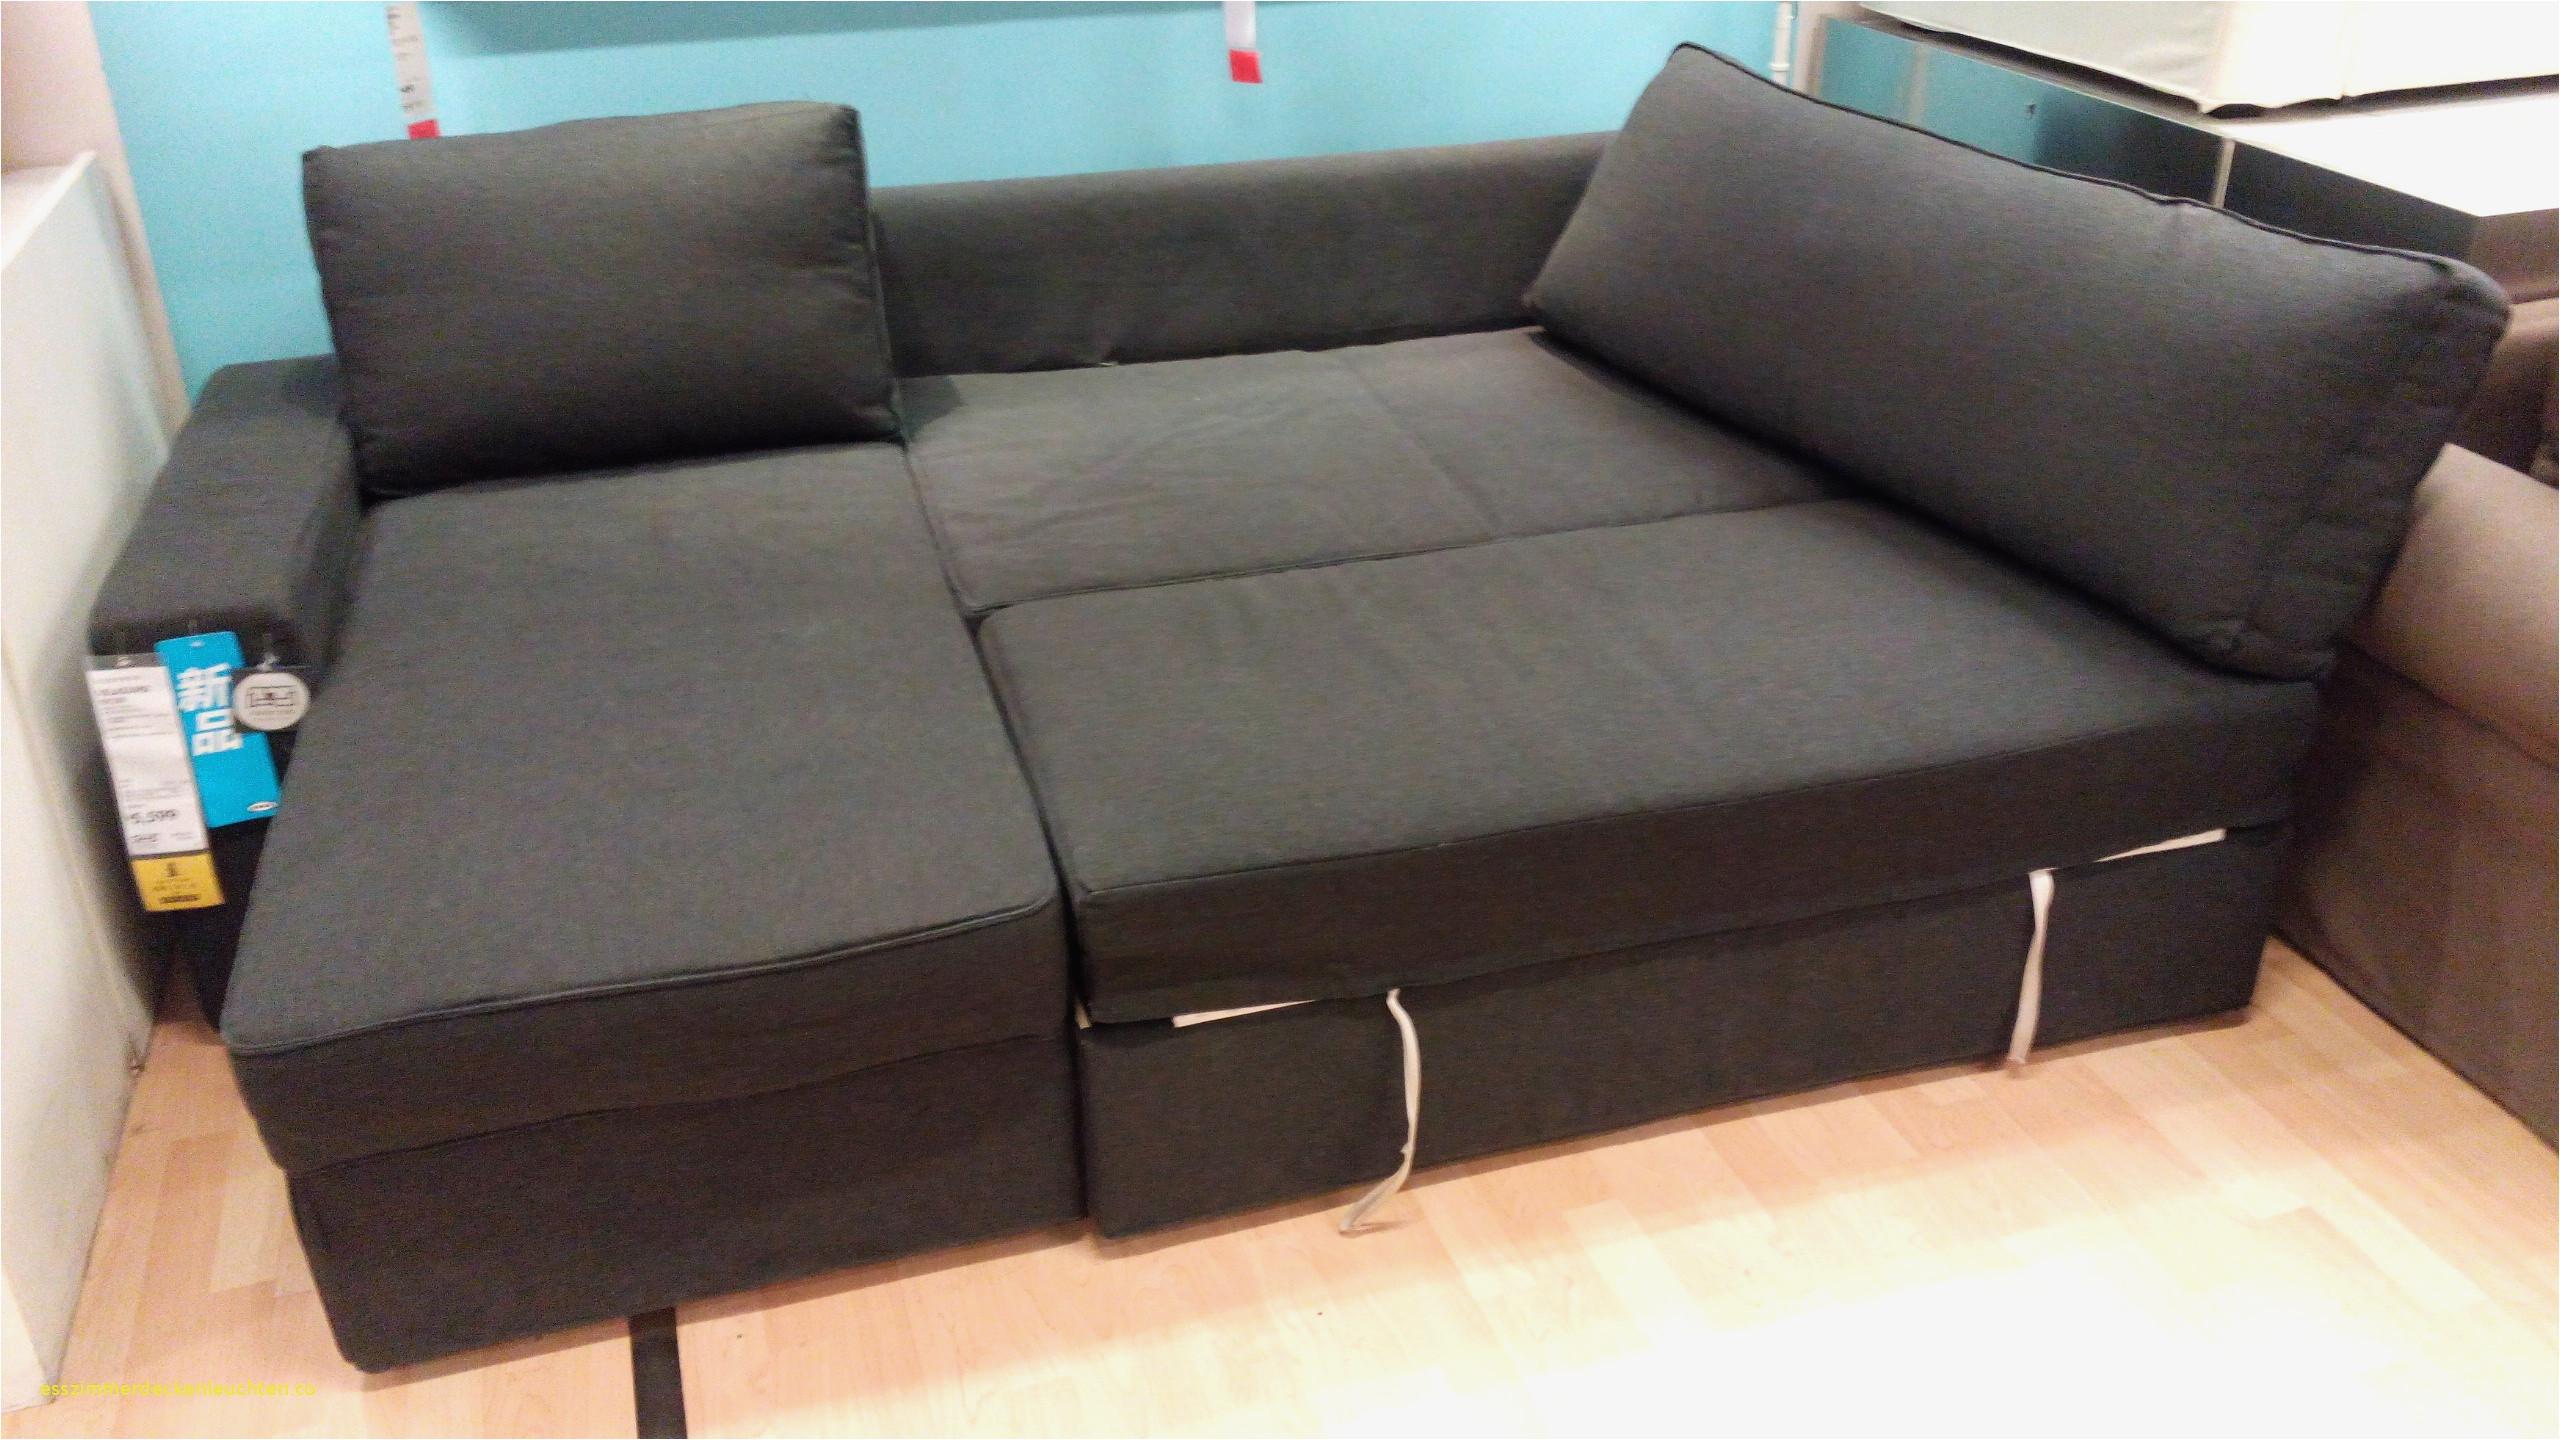 ikea friheten sofa bed review decoration ideas cheap creative and interior design ideas